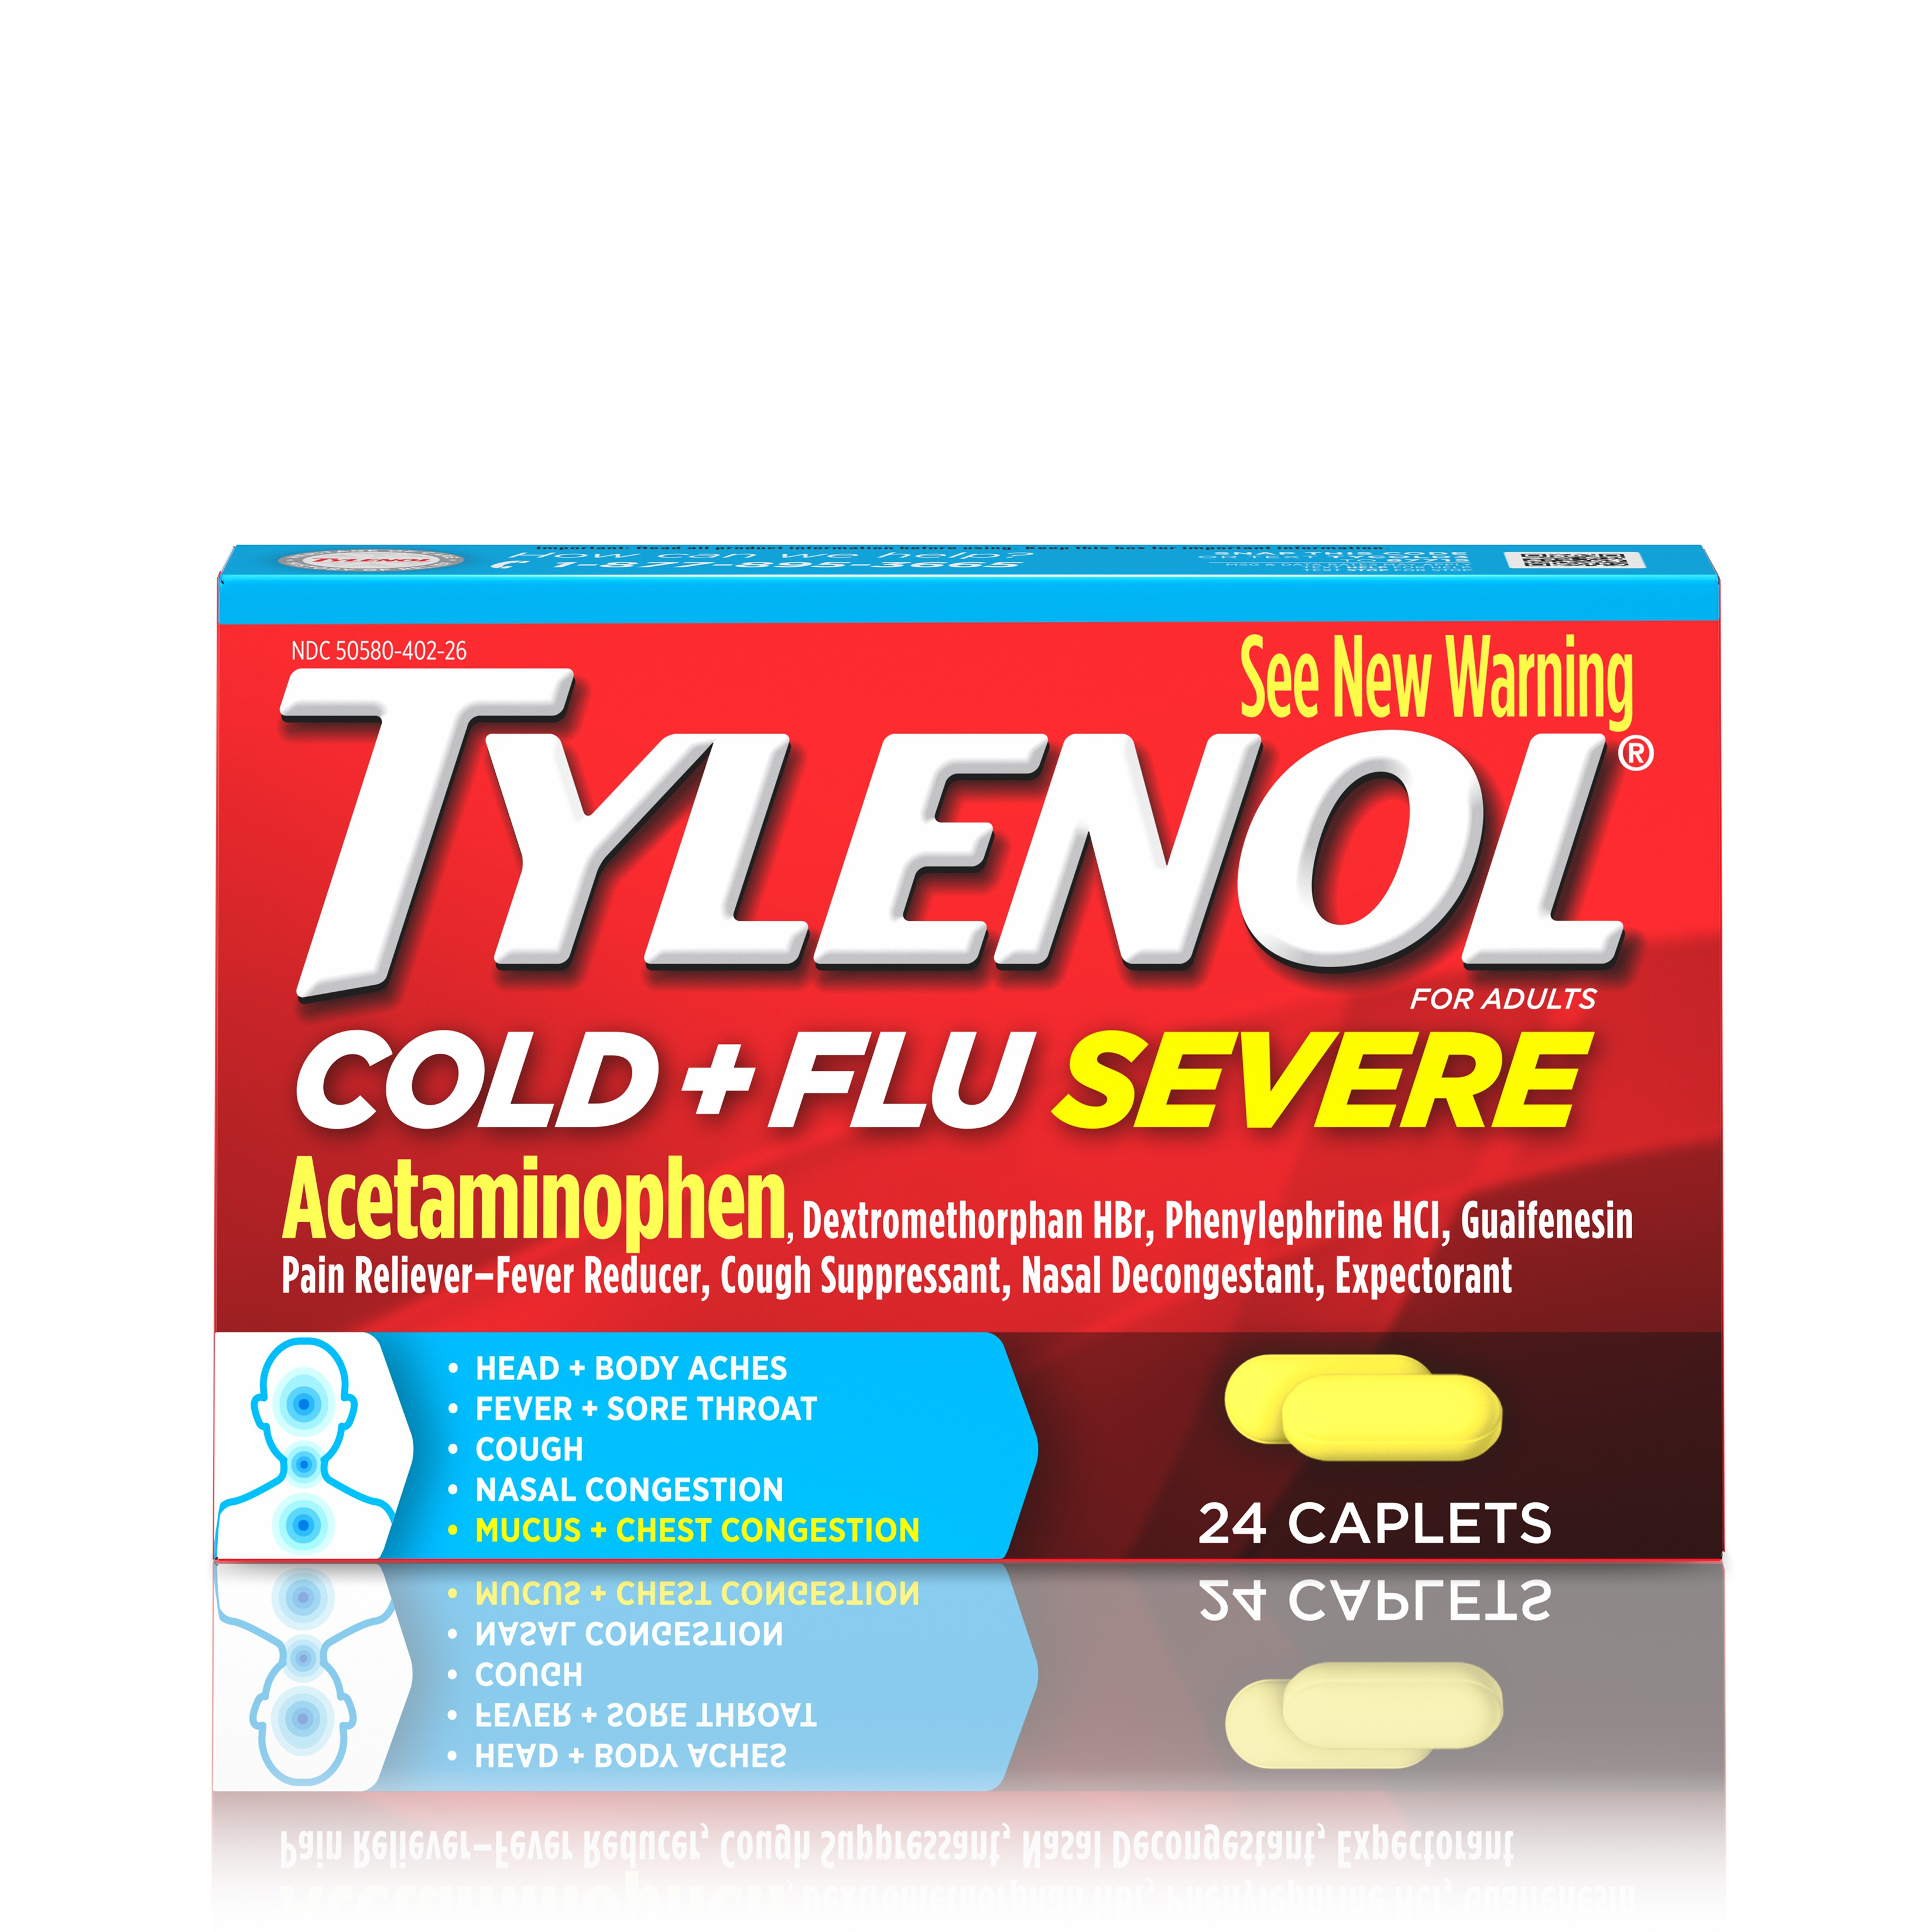 Tylenol Cold + Flu Severe Caplets, 24 Count